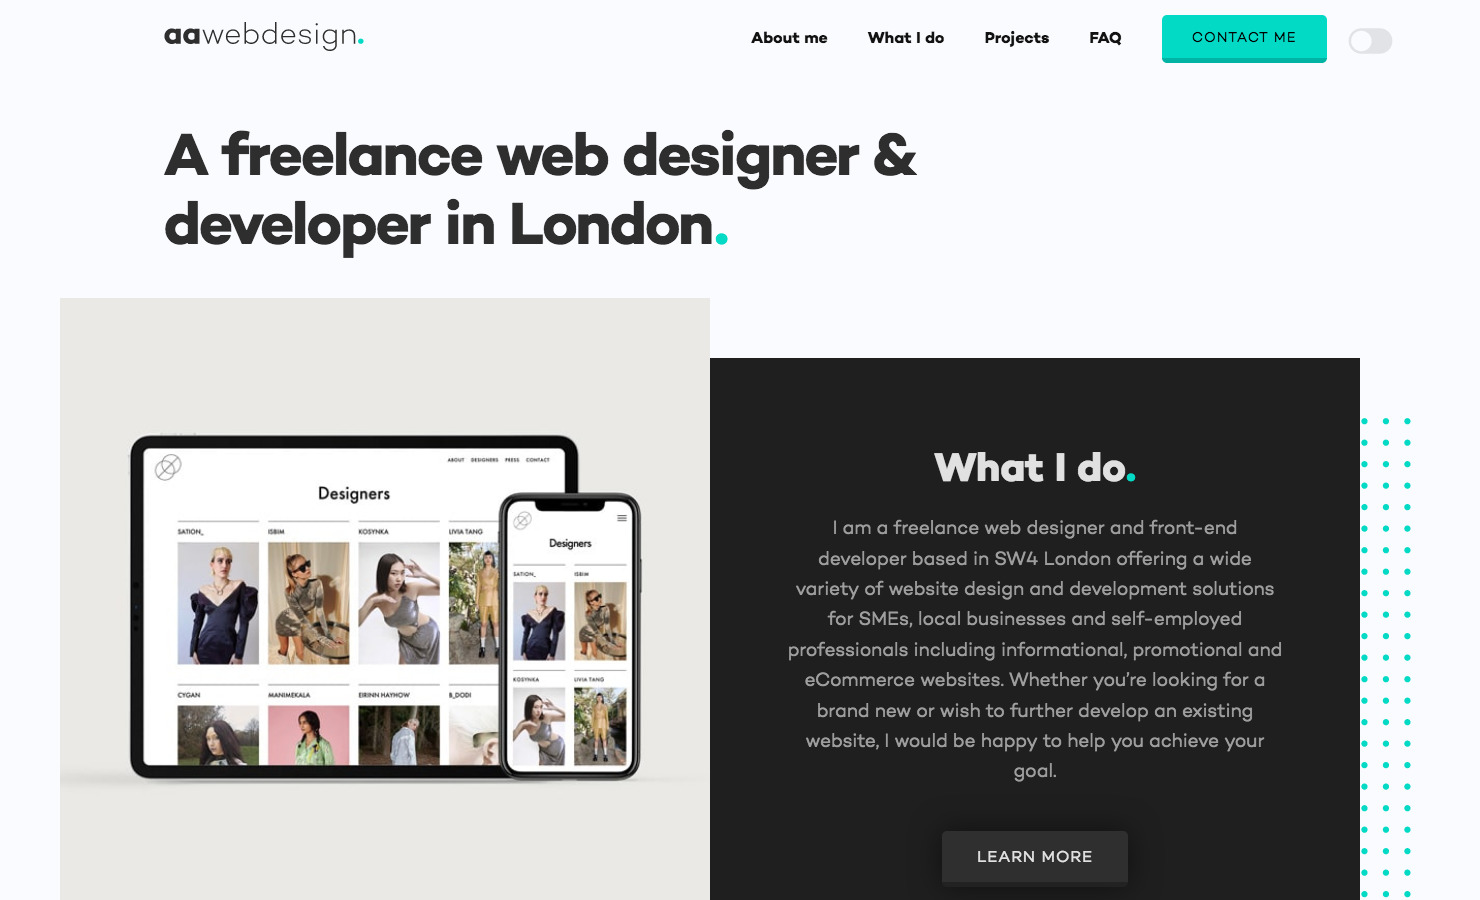 Andre Armacollo Freelance Web Designer